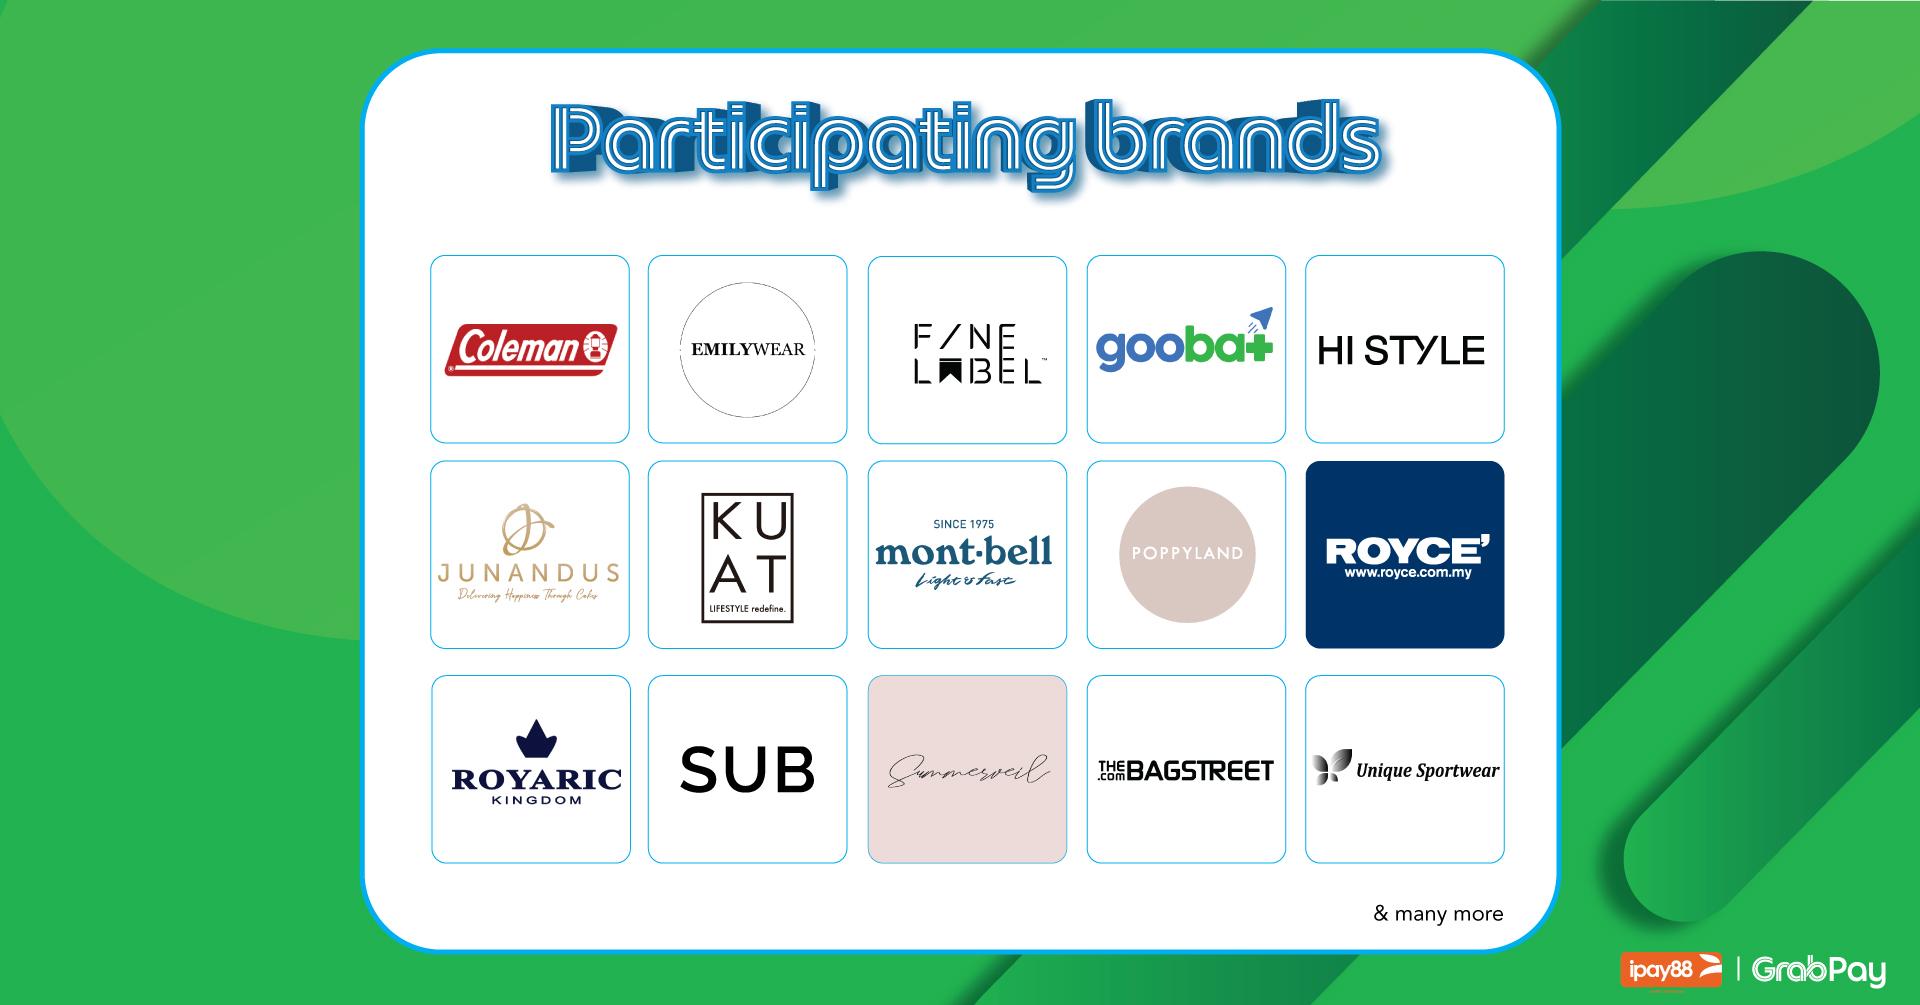 Grabpay&win b2 featured merchants